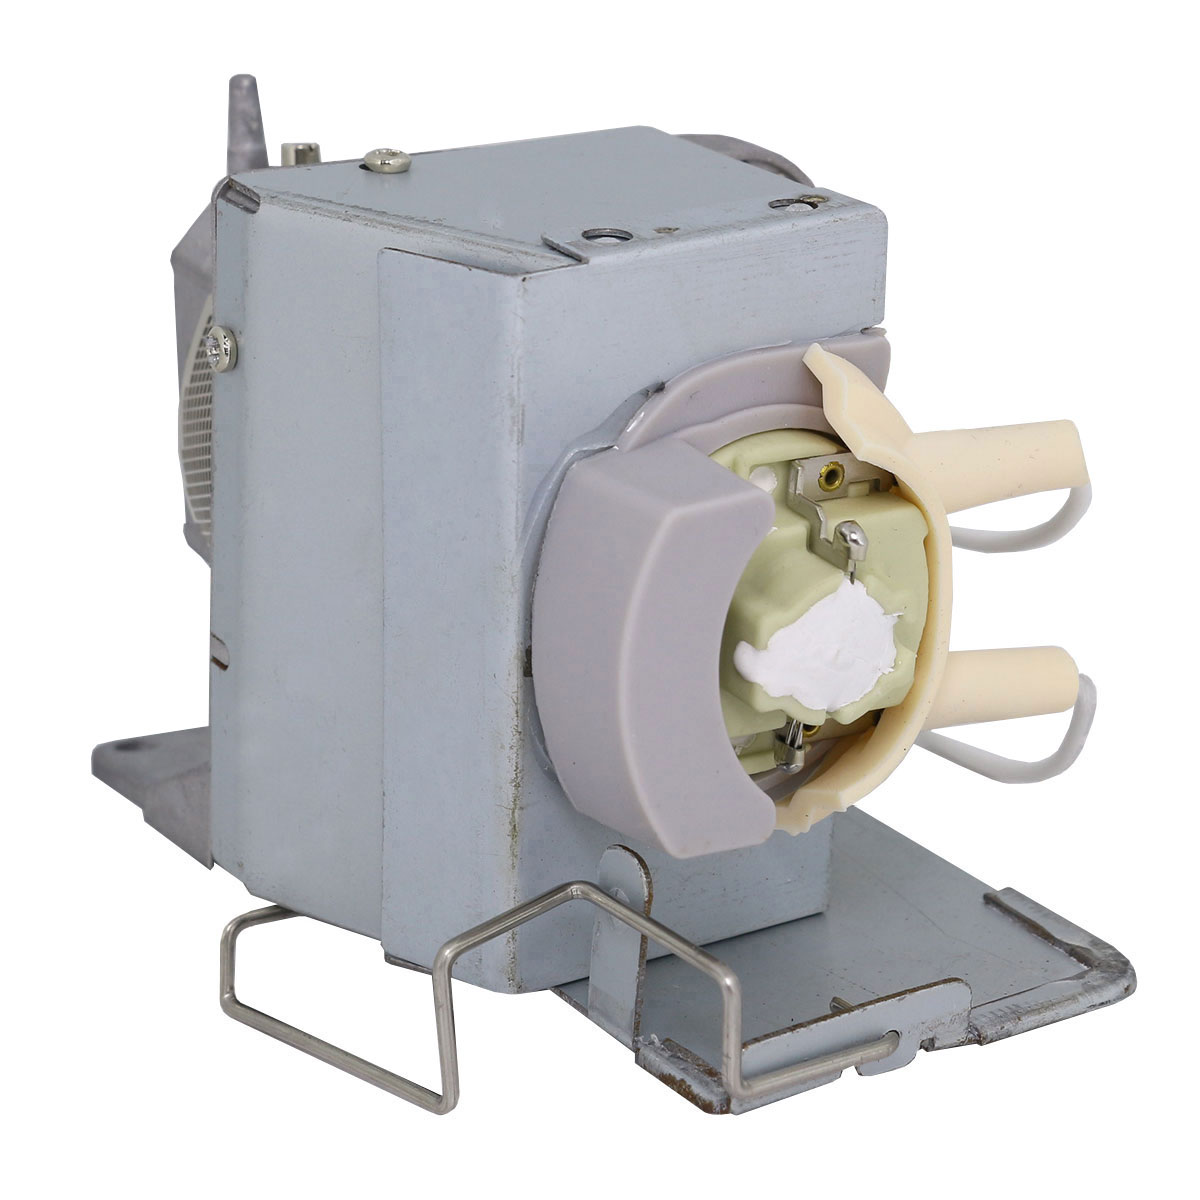 Lutema Platinum for Acer MR.JJU11.002 Projector Lamp (Original Philips Bulb) - image 3 de 5